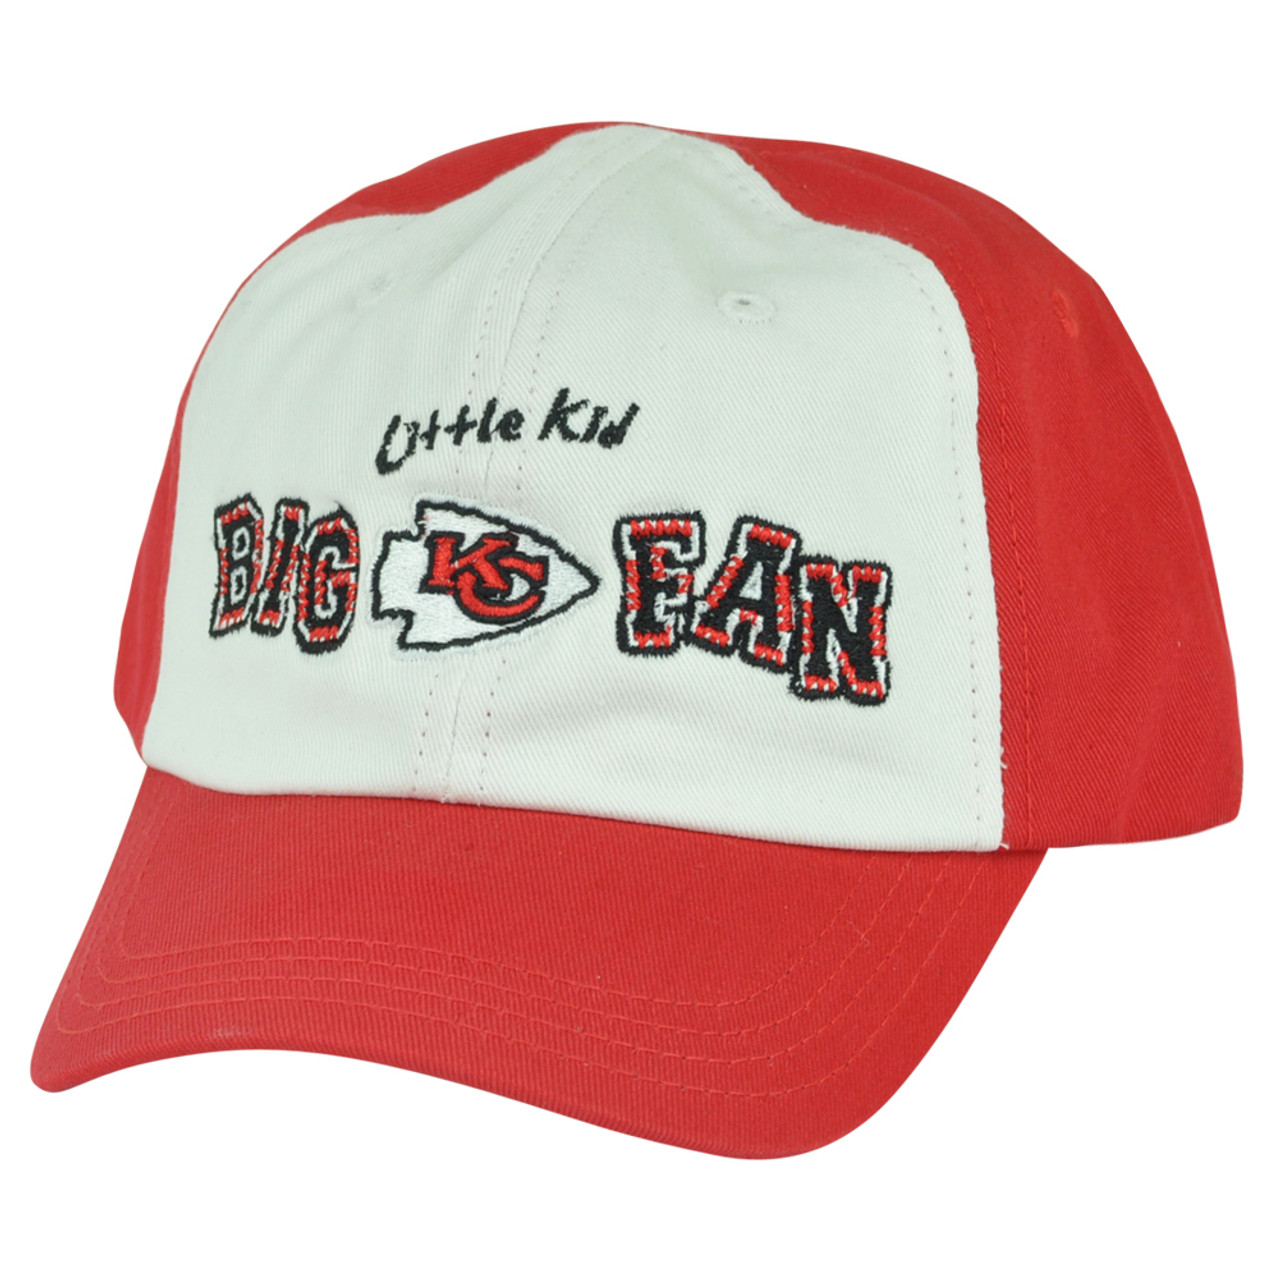 4a832fd6 NFL Kansas City Chiefs Little Kid Big Fan Toddler Boys Garment Wash Red Hat  Cap